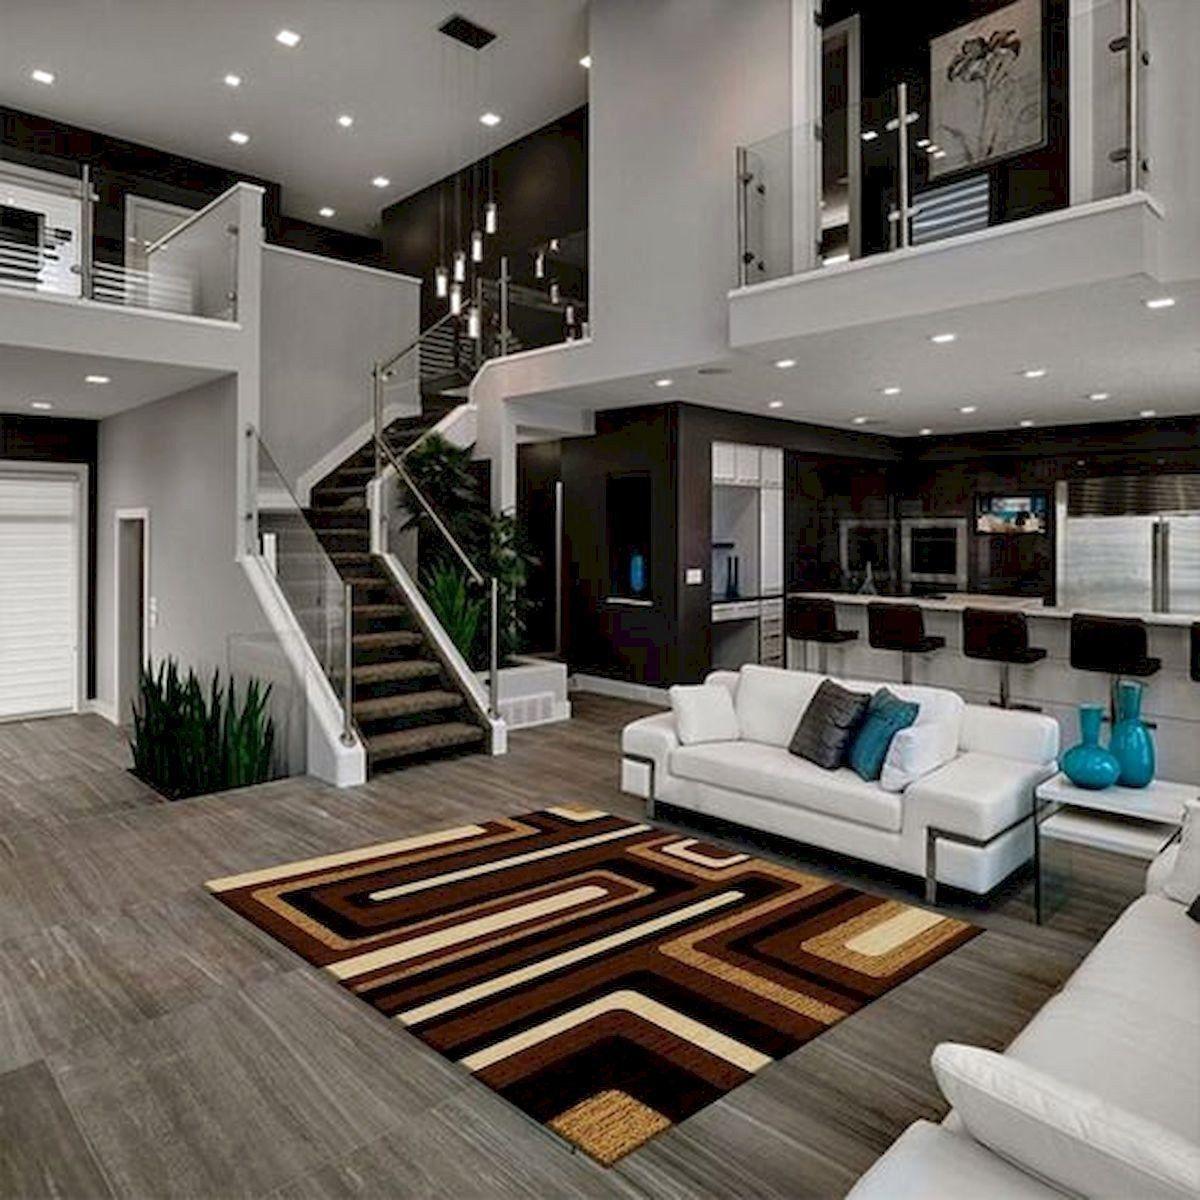 121 Best Living Room Decor Ideas 17 World Inspiration Modern House Design House Interior House Modern home design ideas for living room